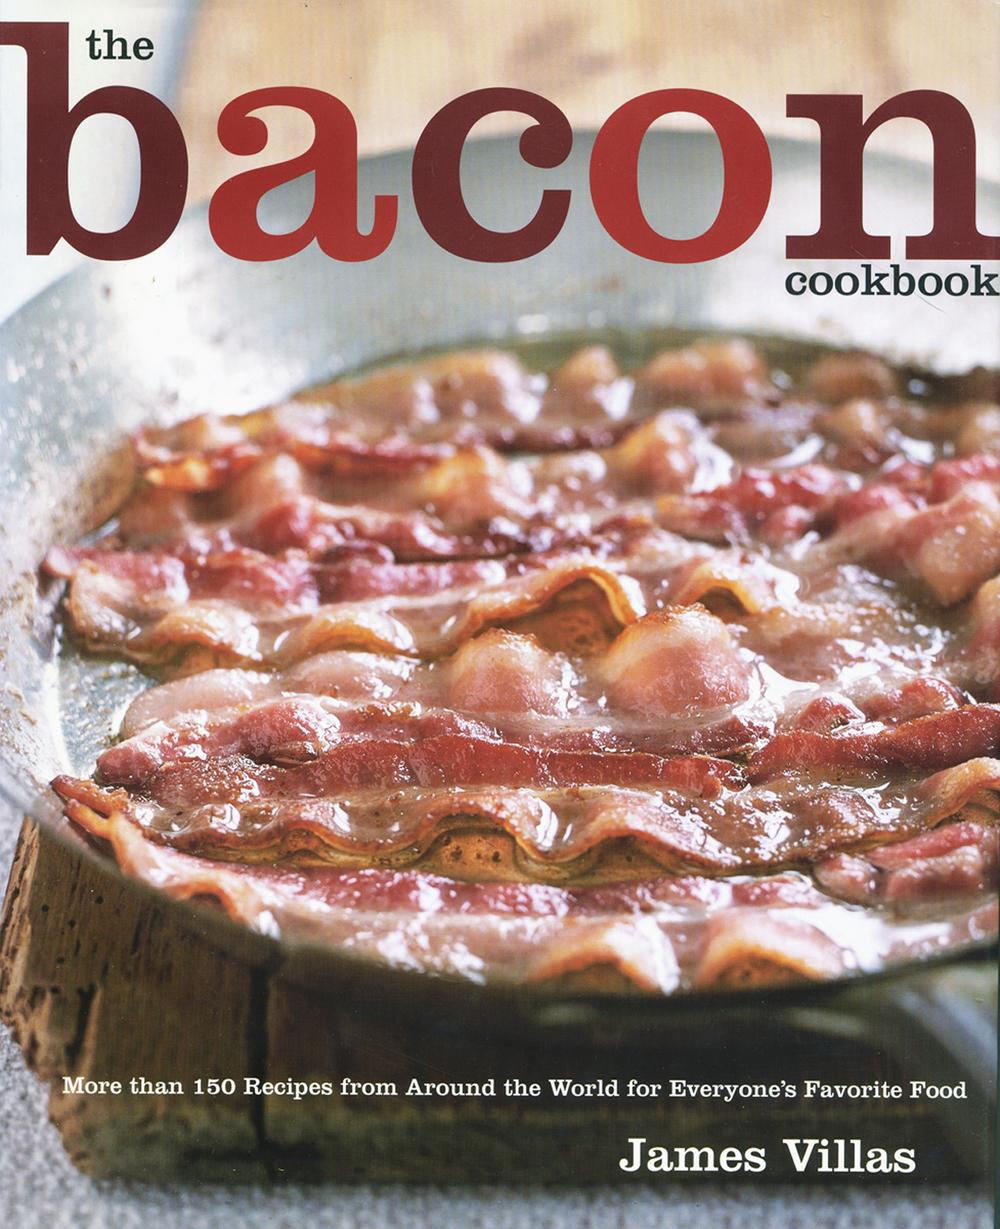 038_Bacon.jpg